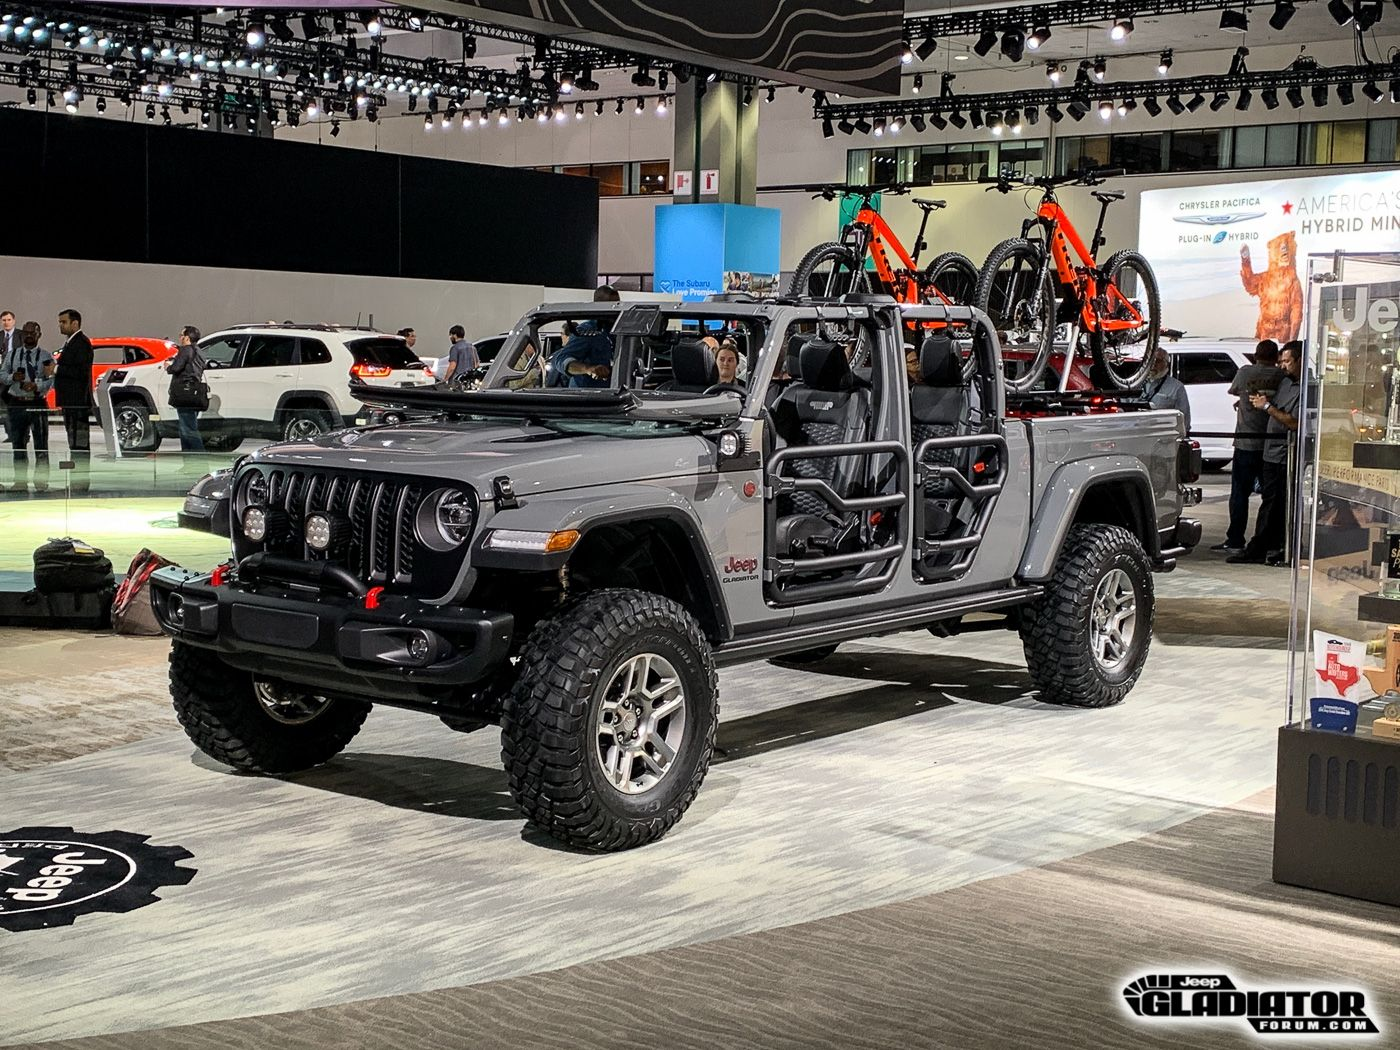 Sting Gray Gladiator Jt Club Jeep Gladiator Gladiator Jeep Suv